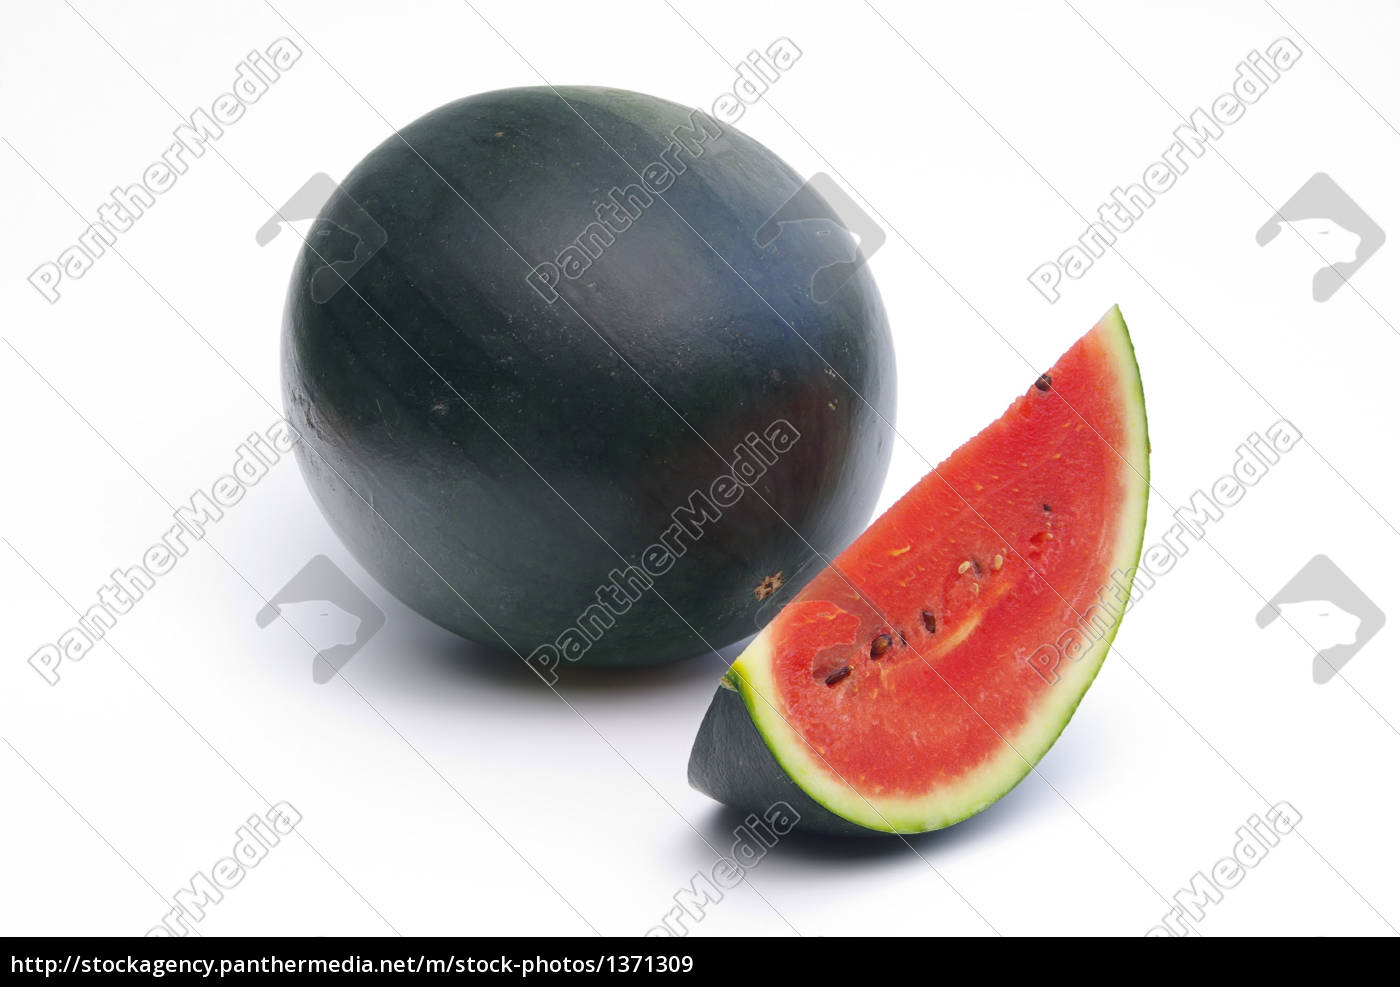 melon, -, watermelon, 05 - 1371309